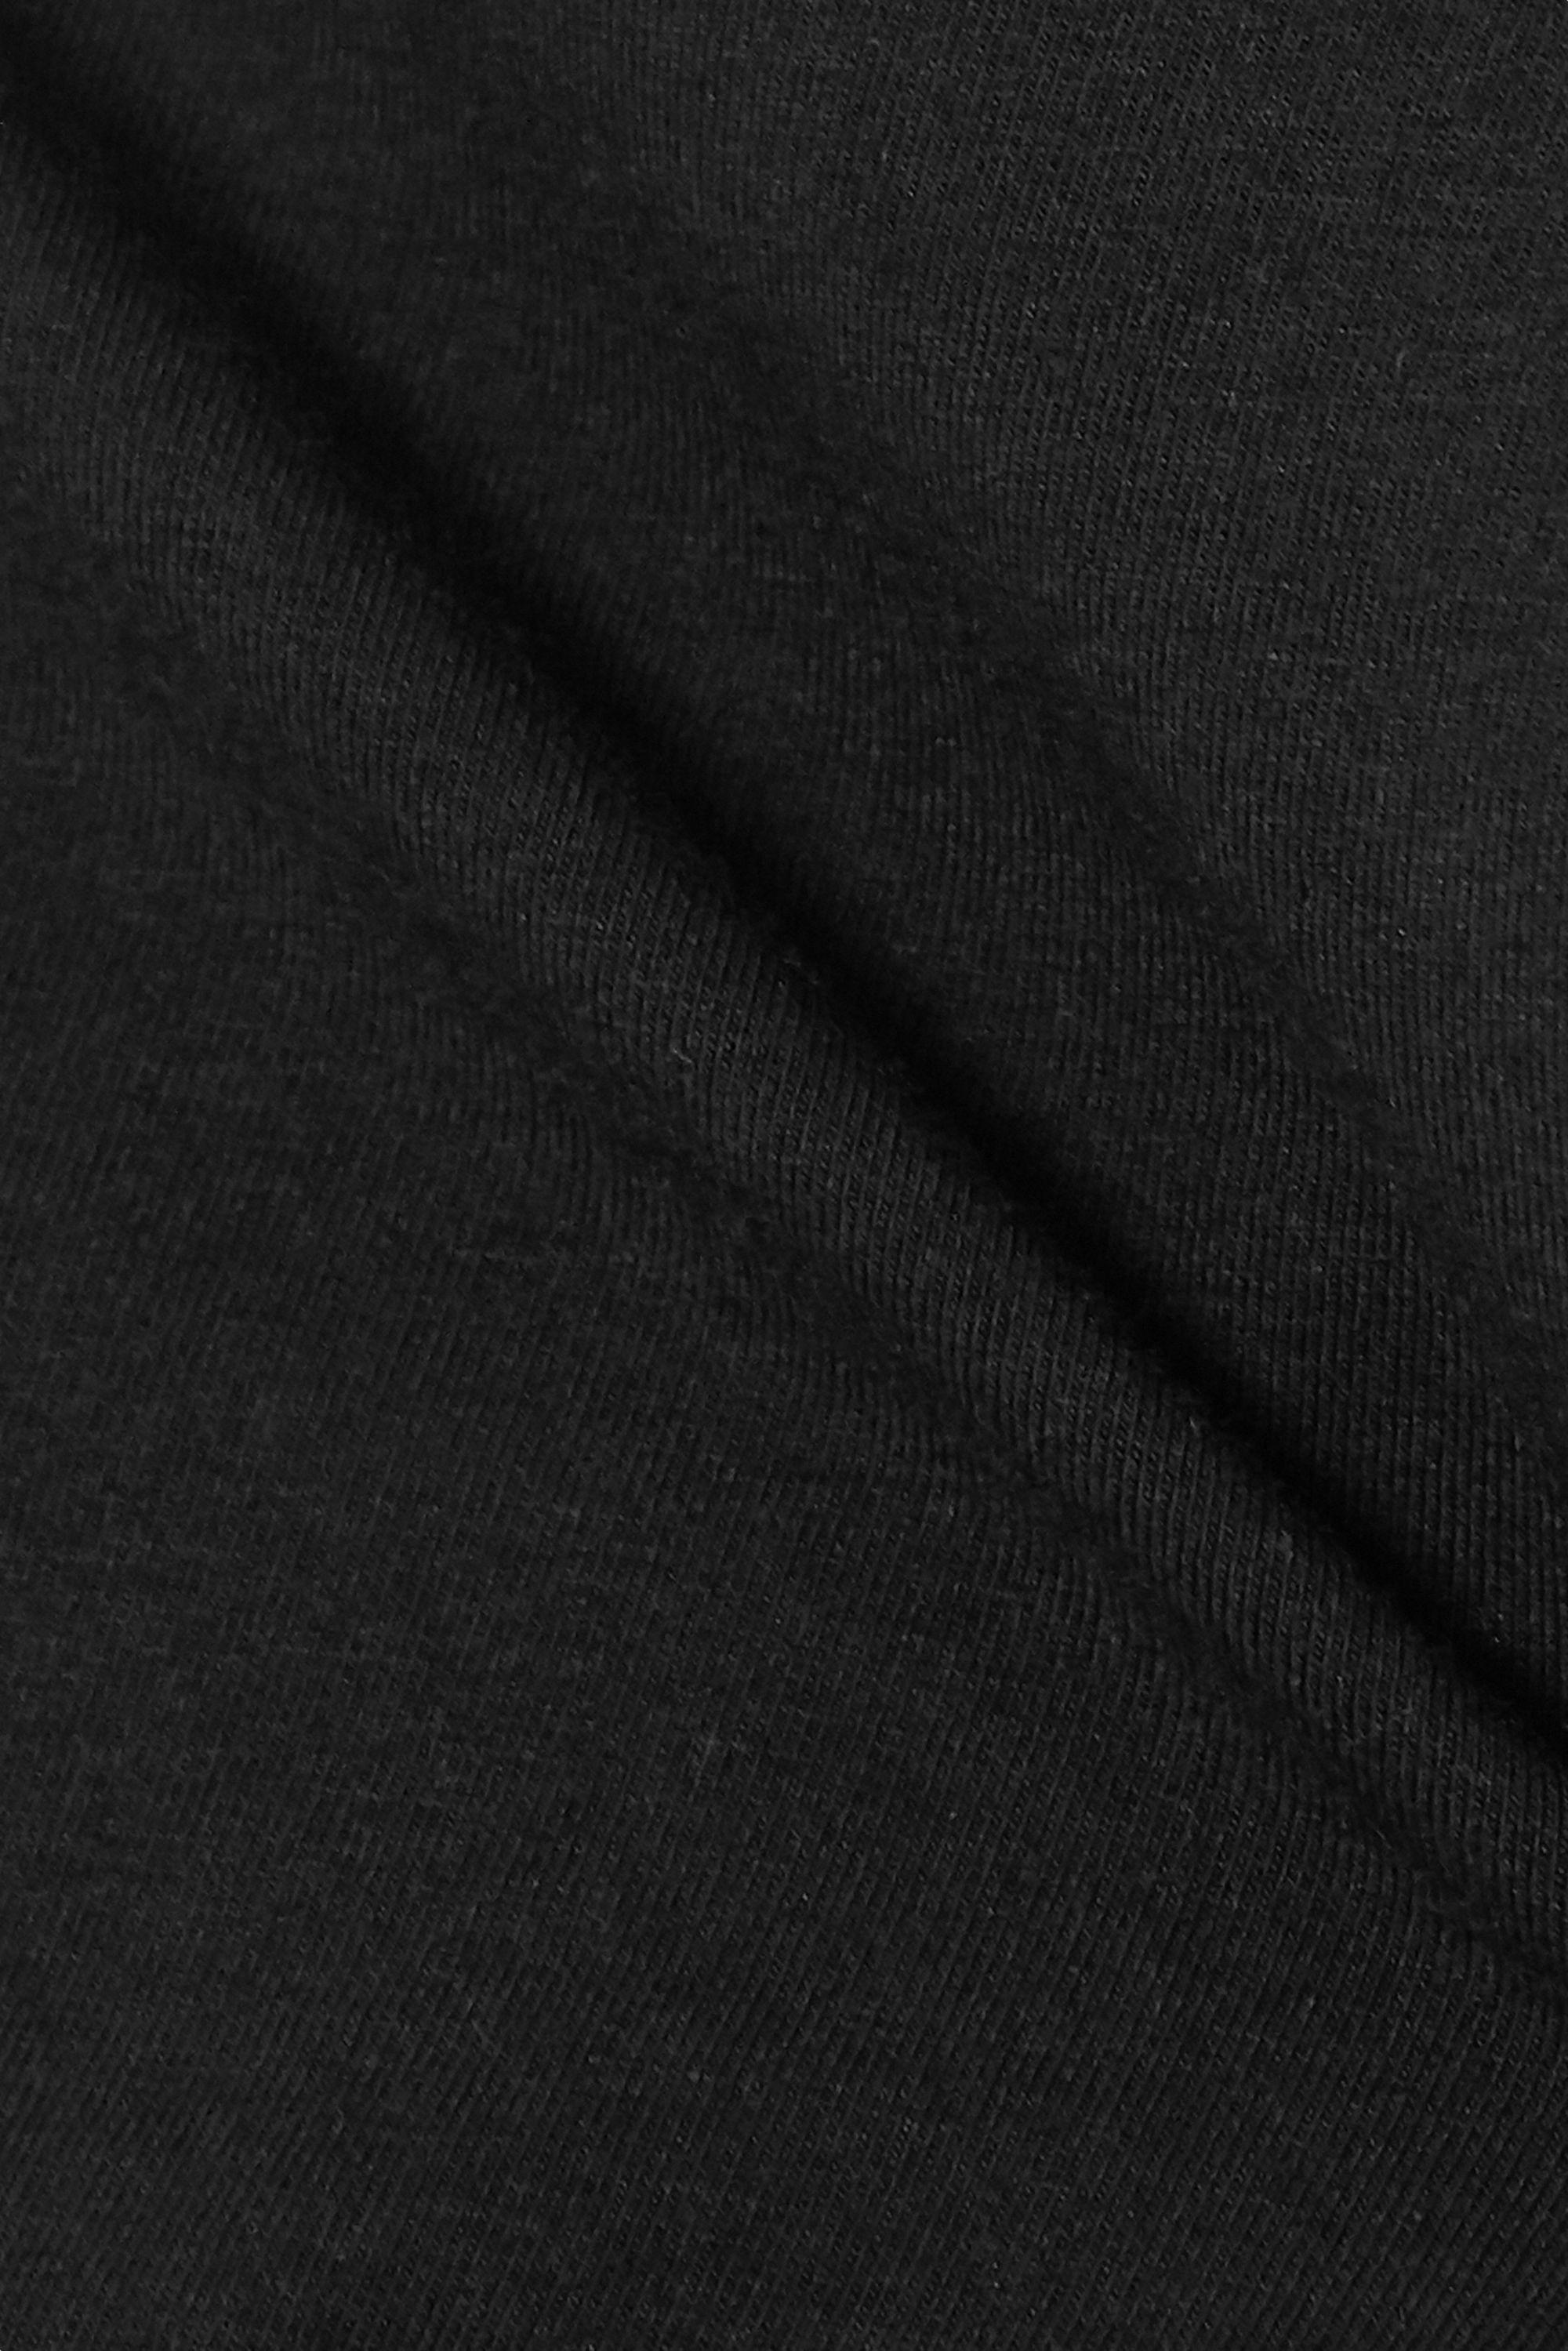 Black Clio Cropped Stretch Organic Pima Cotton-jersey Top | Skin